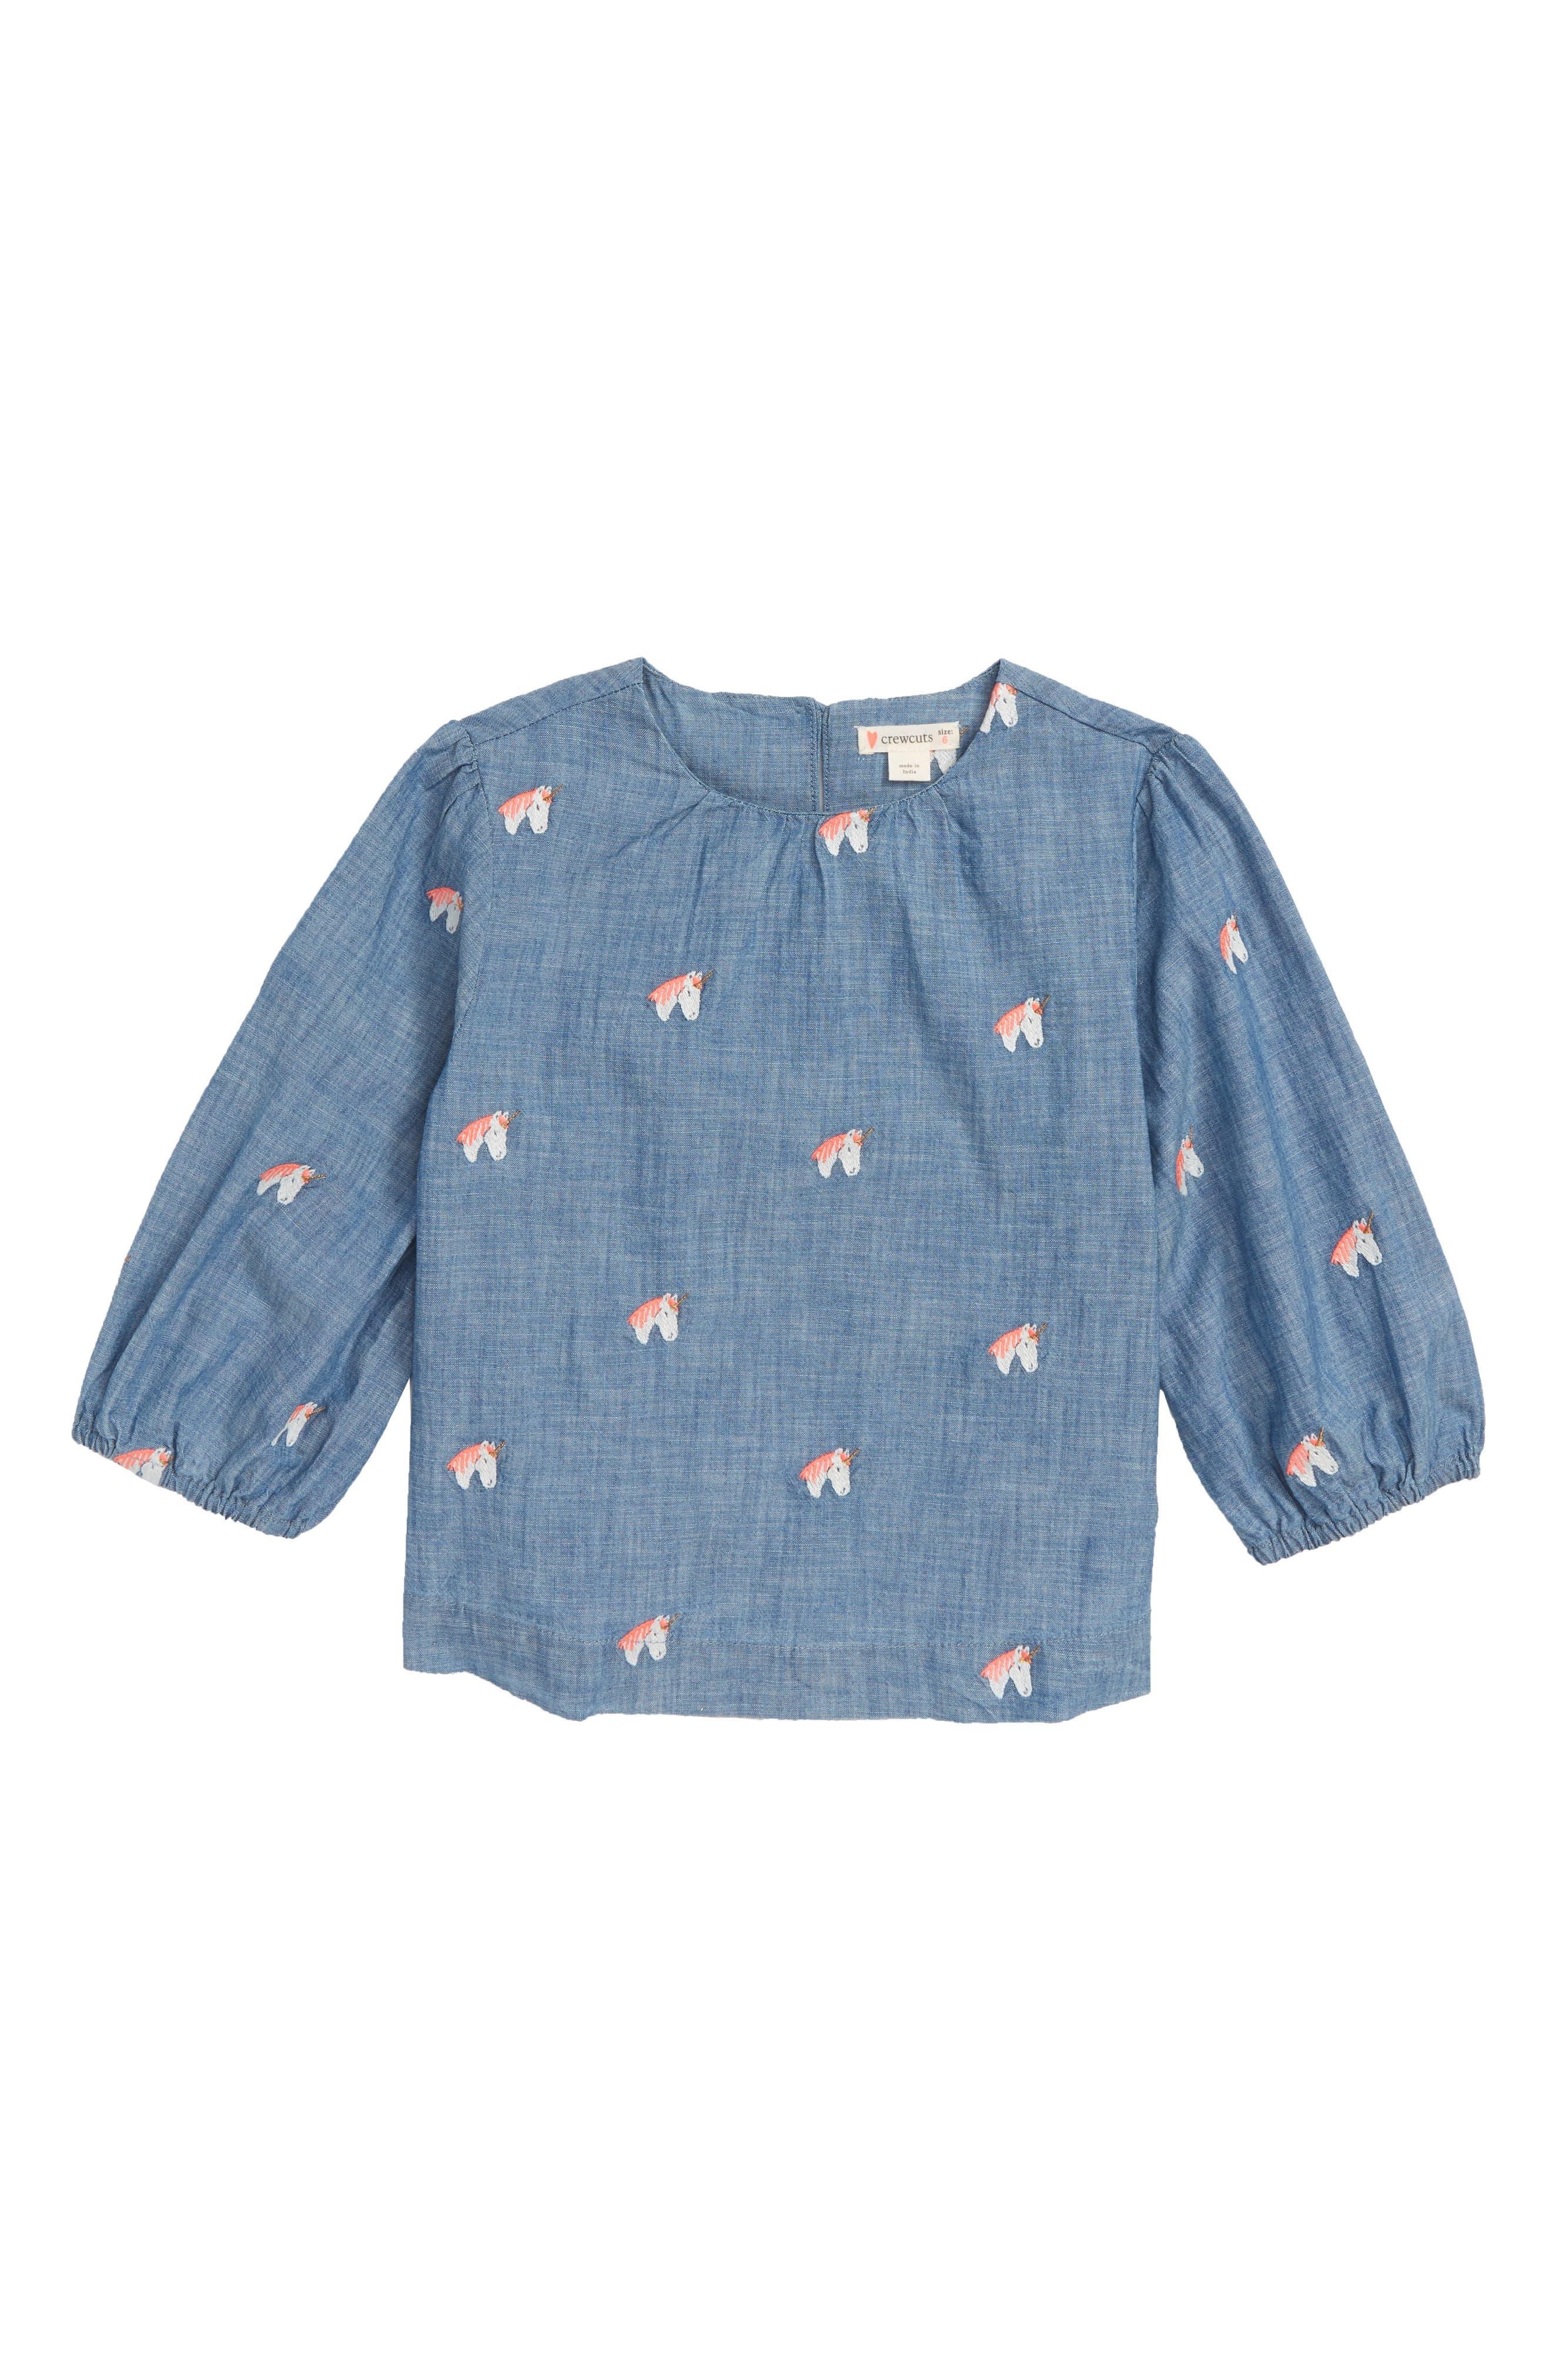 CREWCUTS BY J.CREW,                             Unicorn Chambray Popover Shirt,                             Main thumbnail 1, color,                             400